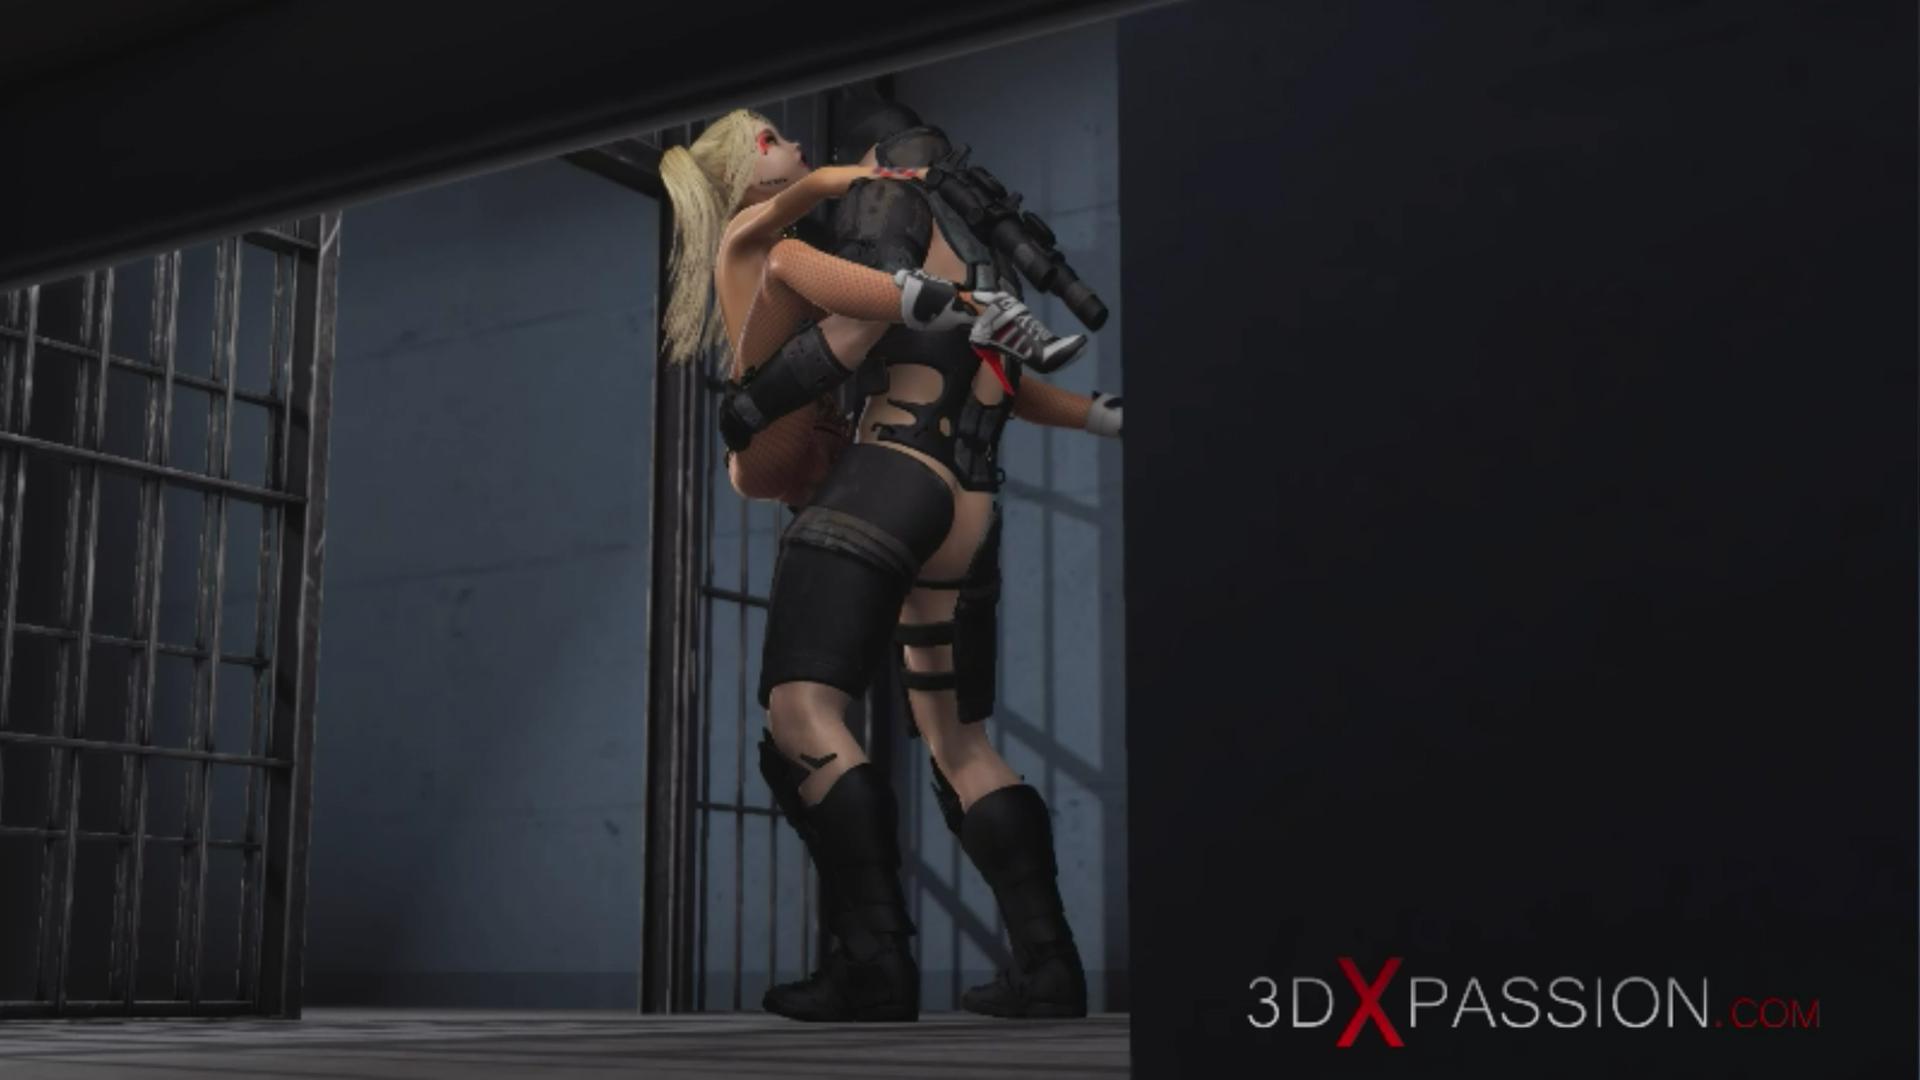 Batman fucks hard Harley Quinn in jail standing fuck